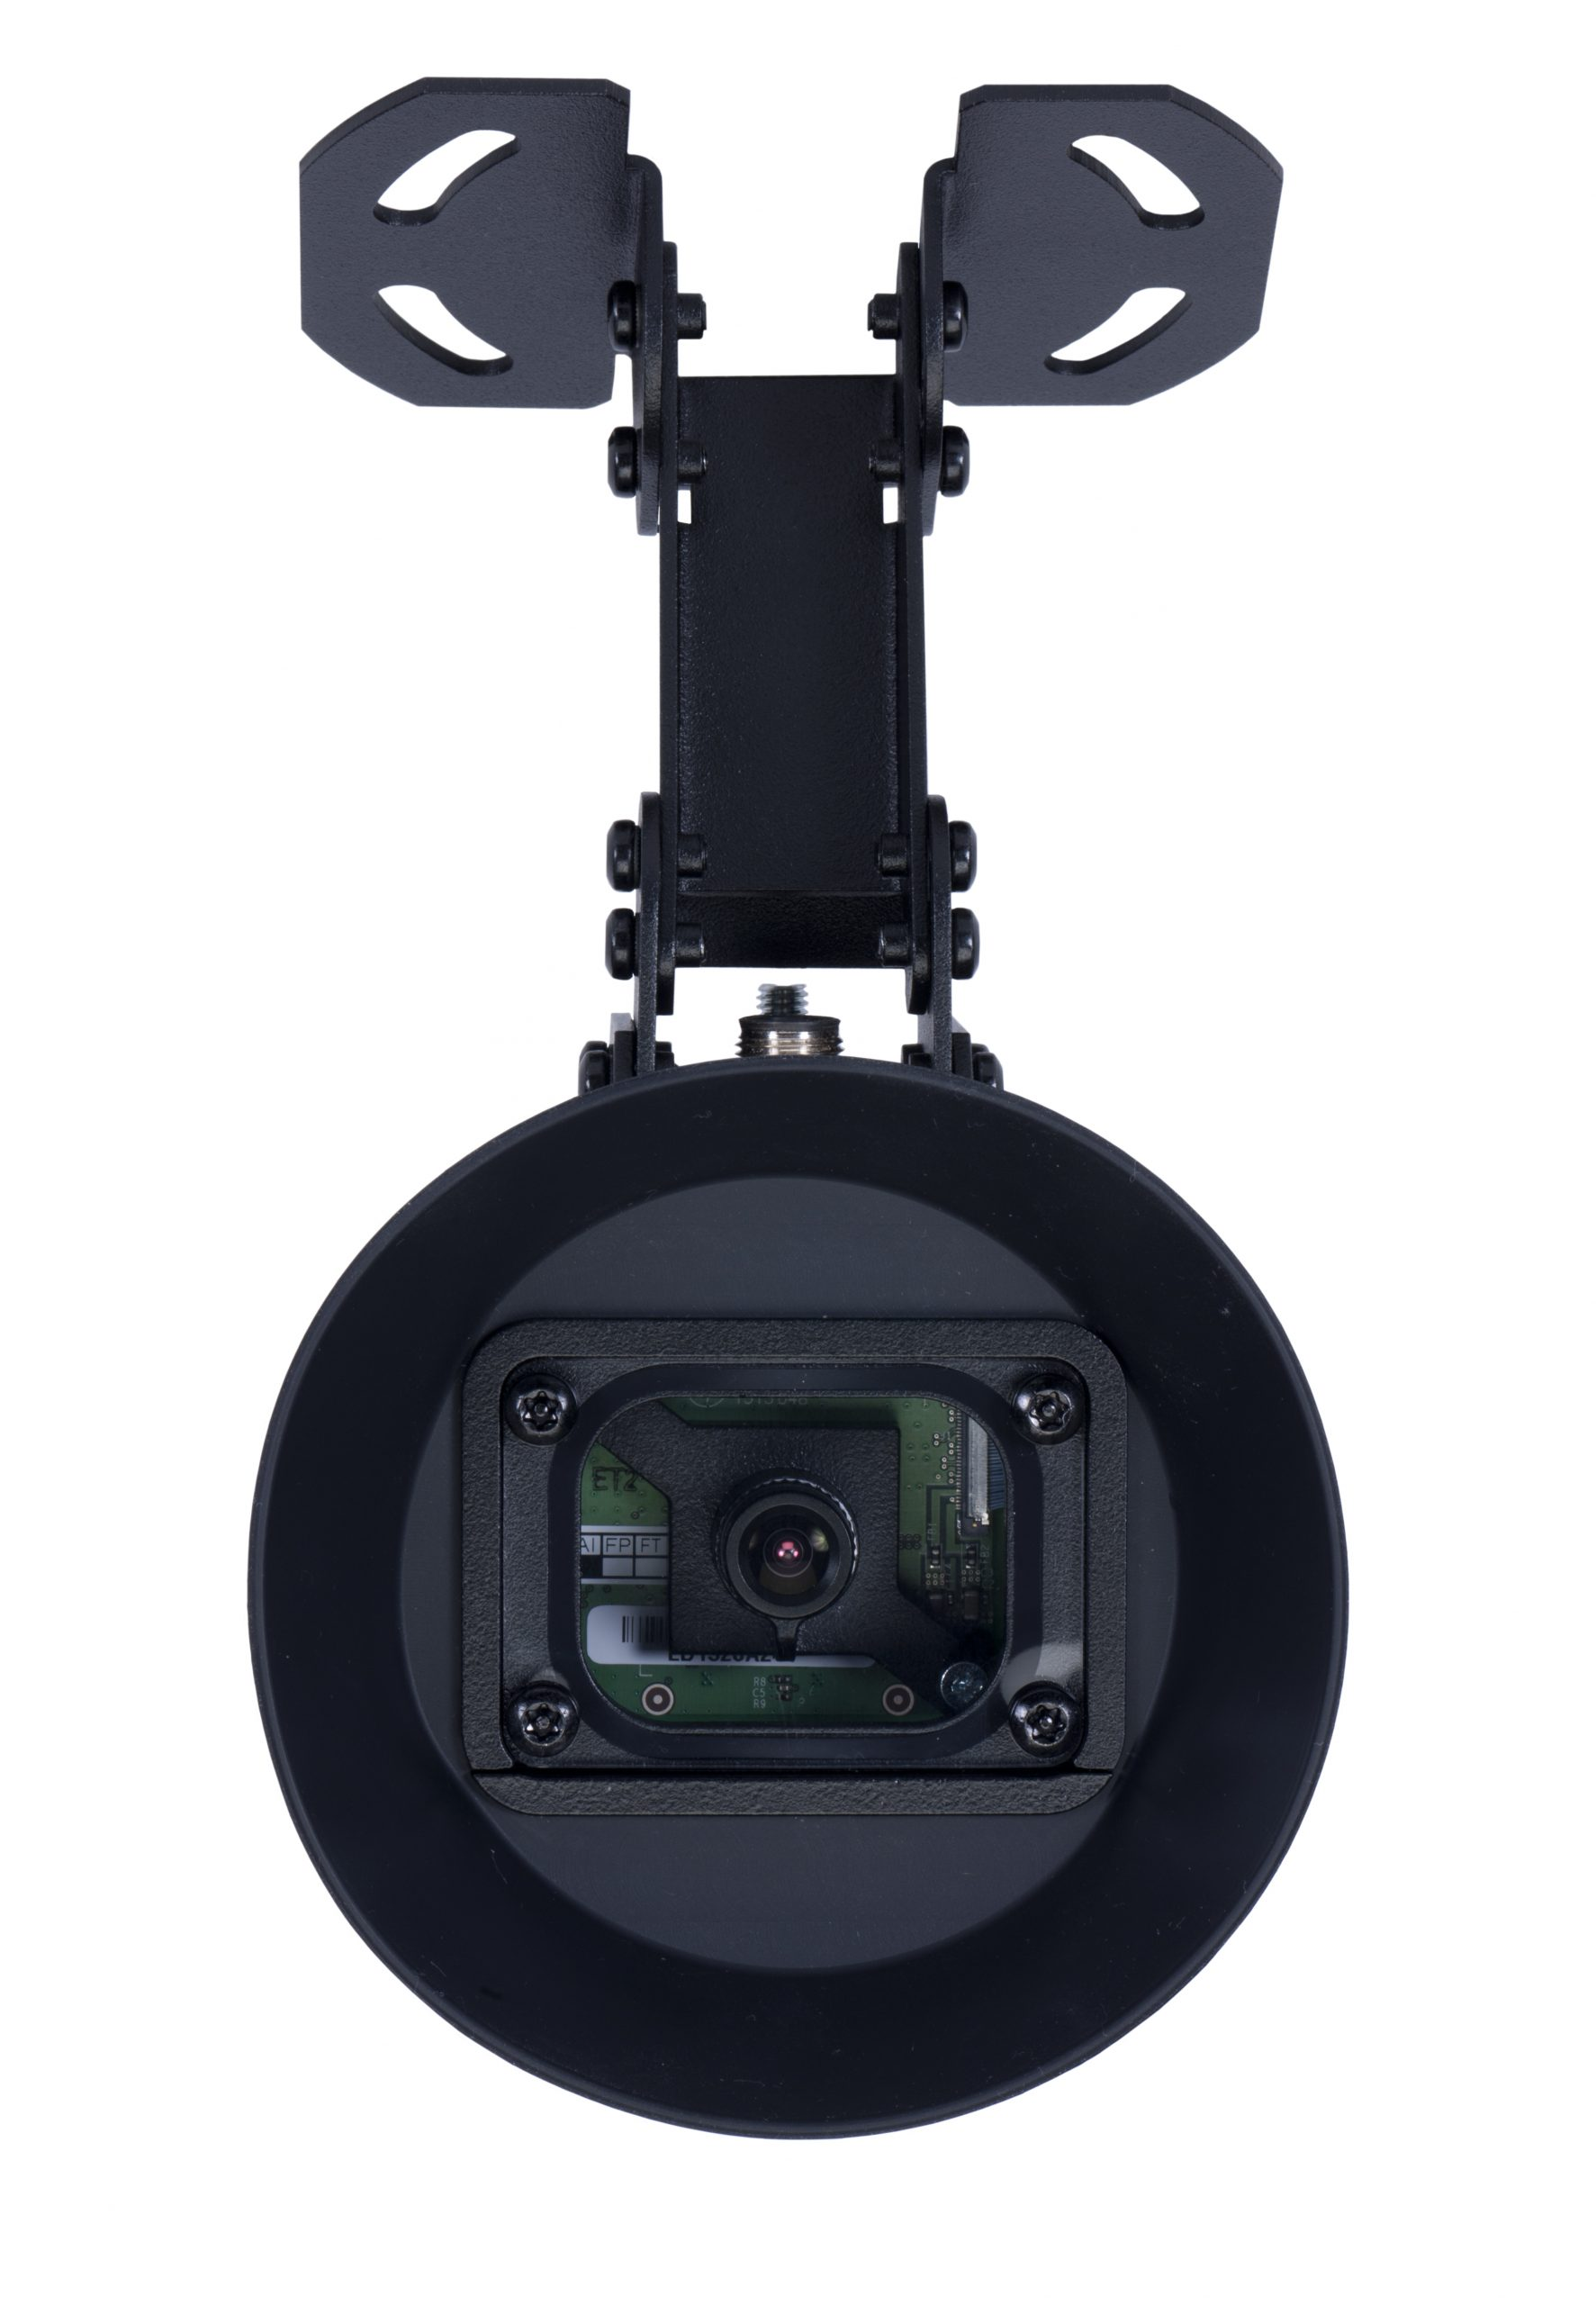 product image of the SE2 fleet dash camera